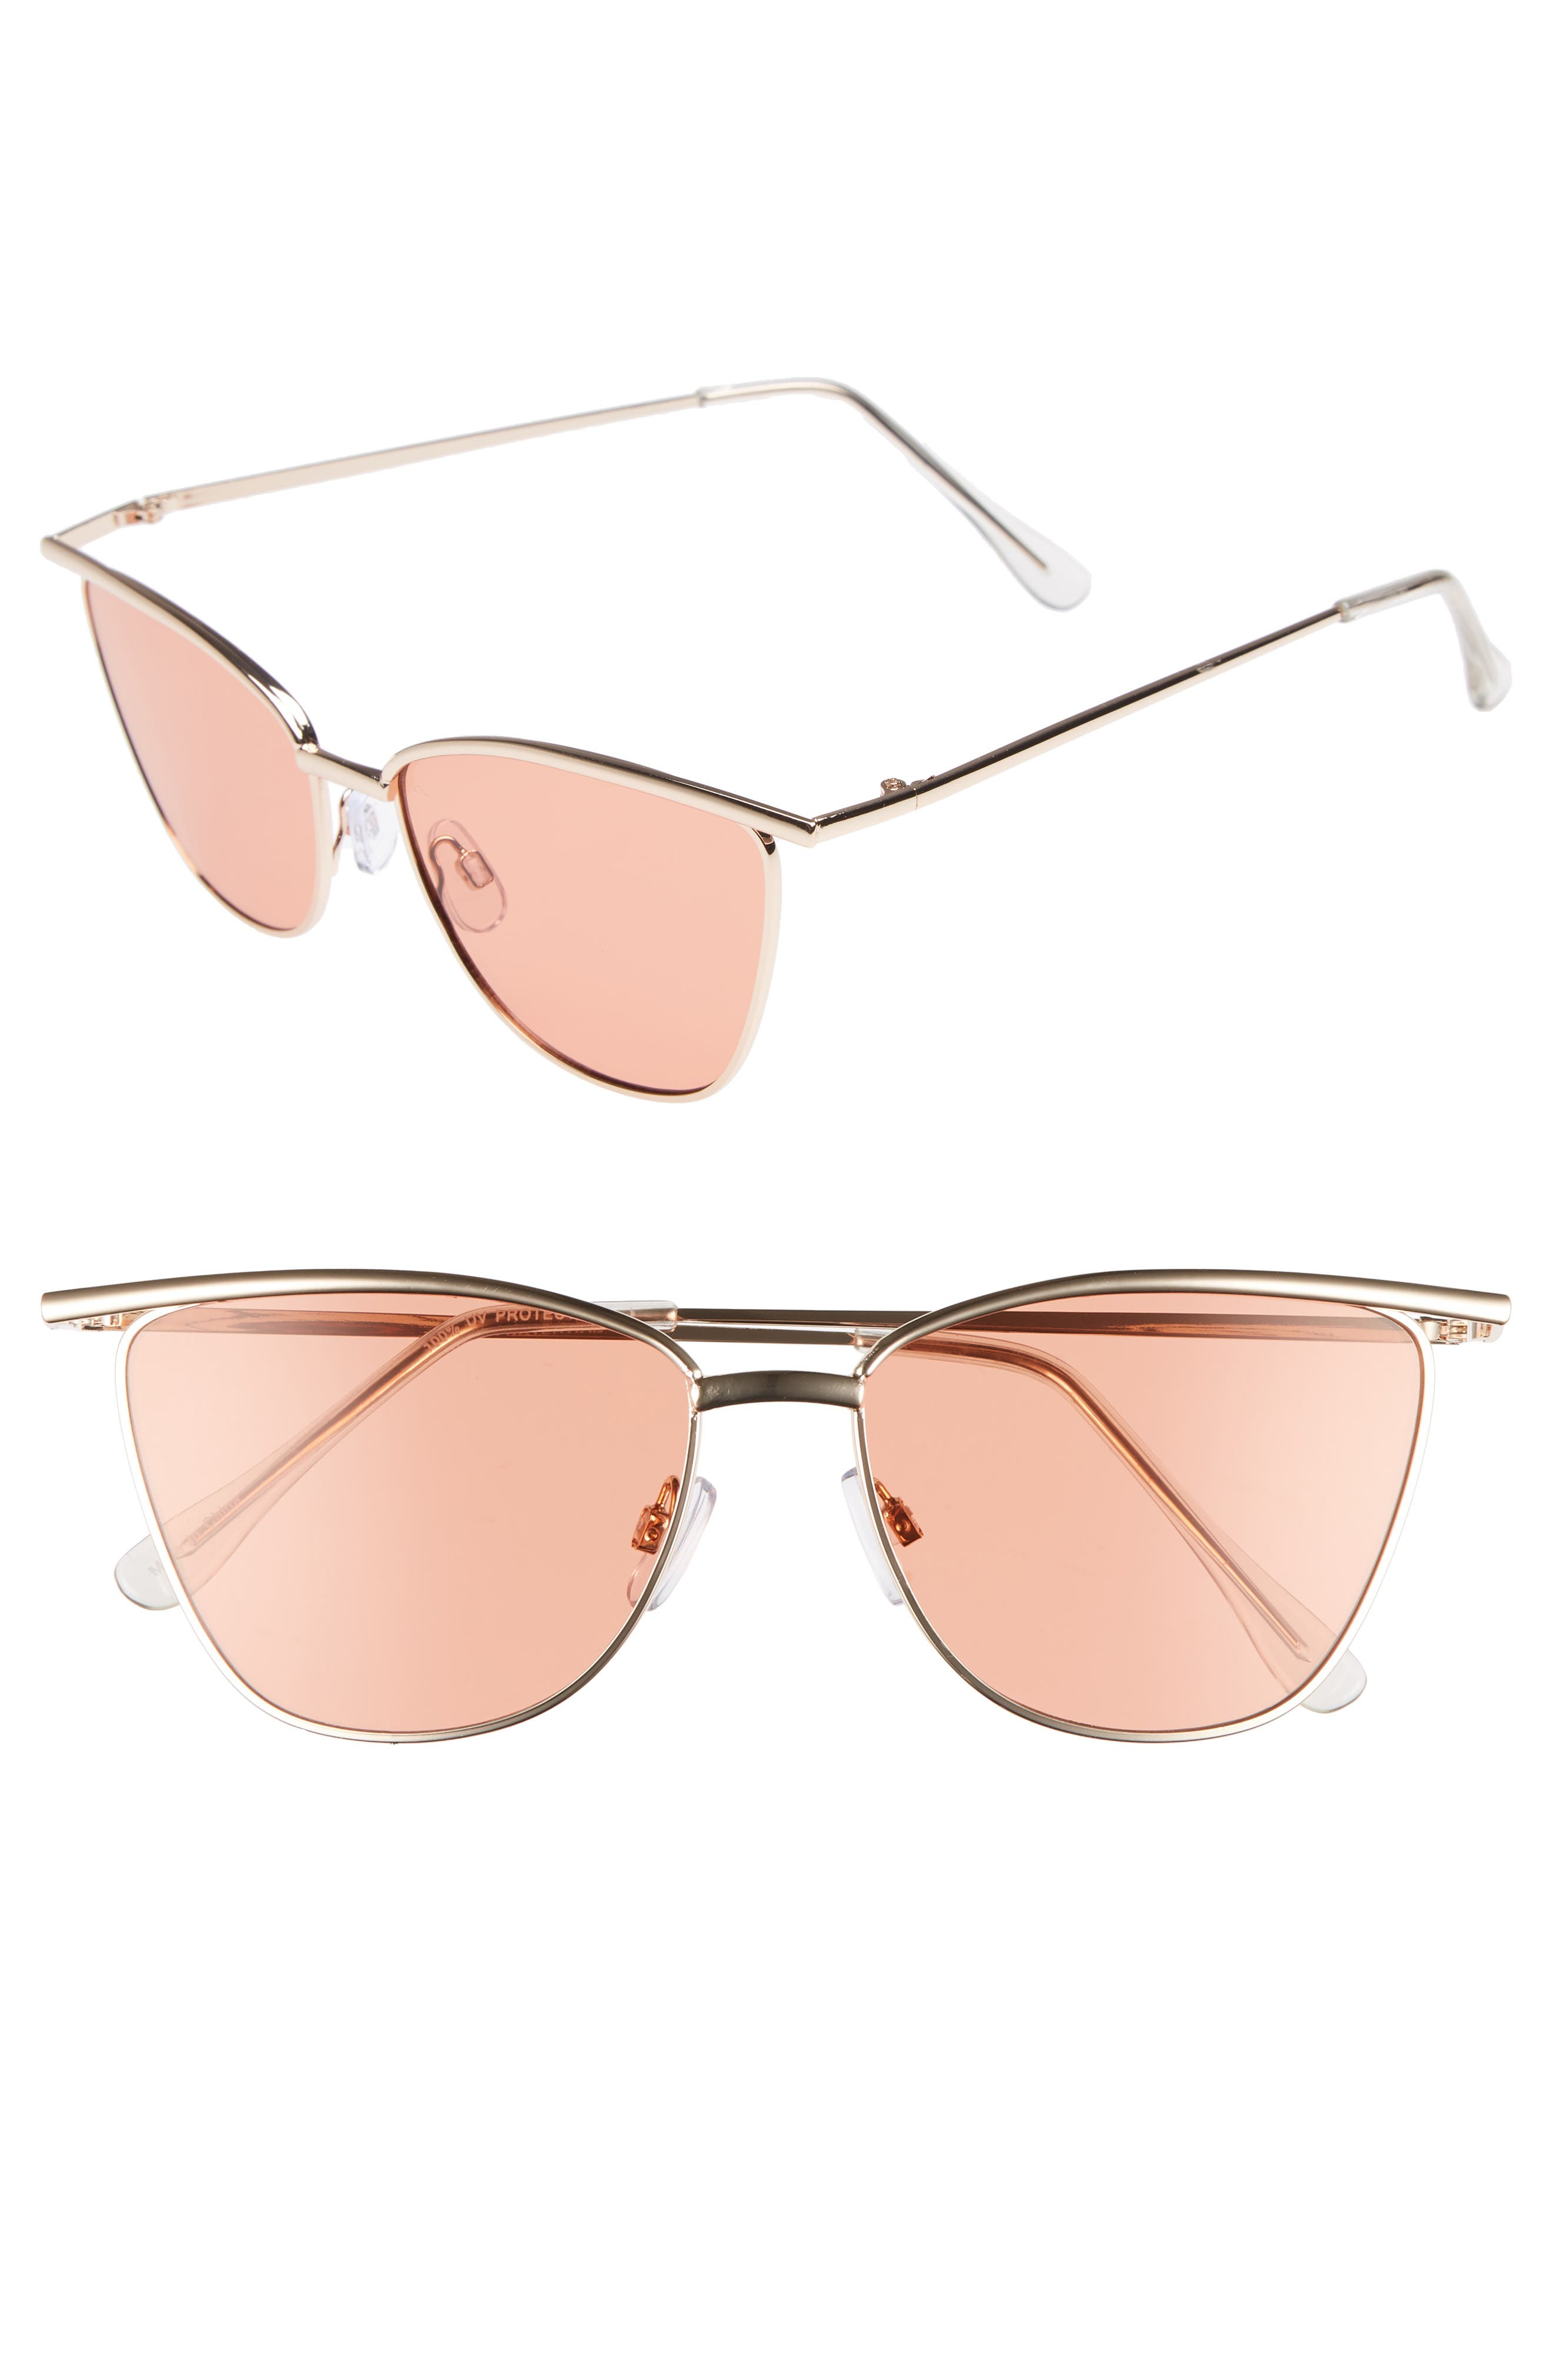 55mm Winged Cat Eye Sunglasses,                         Main,                         color, Gold/ Black